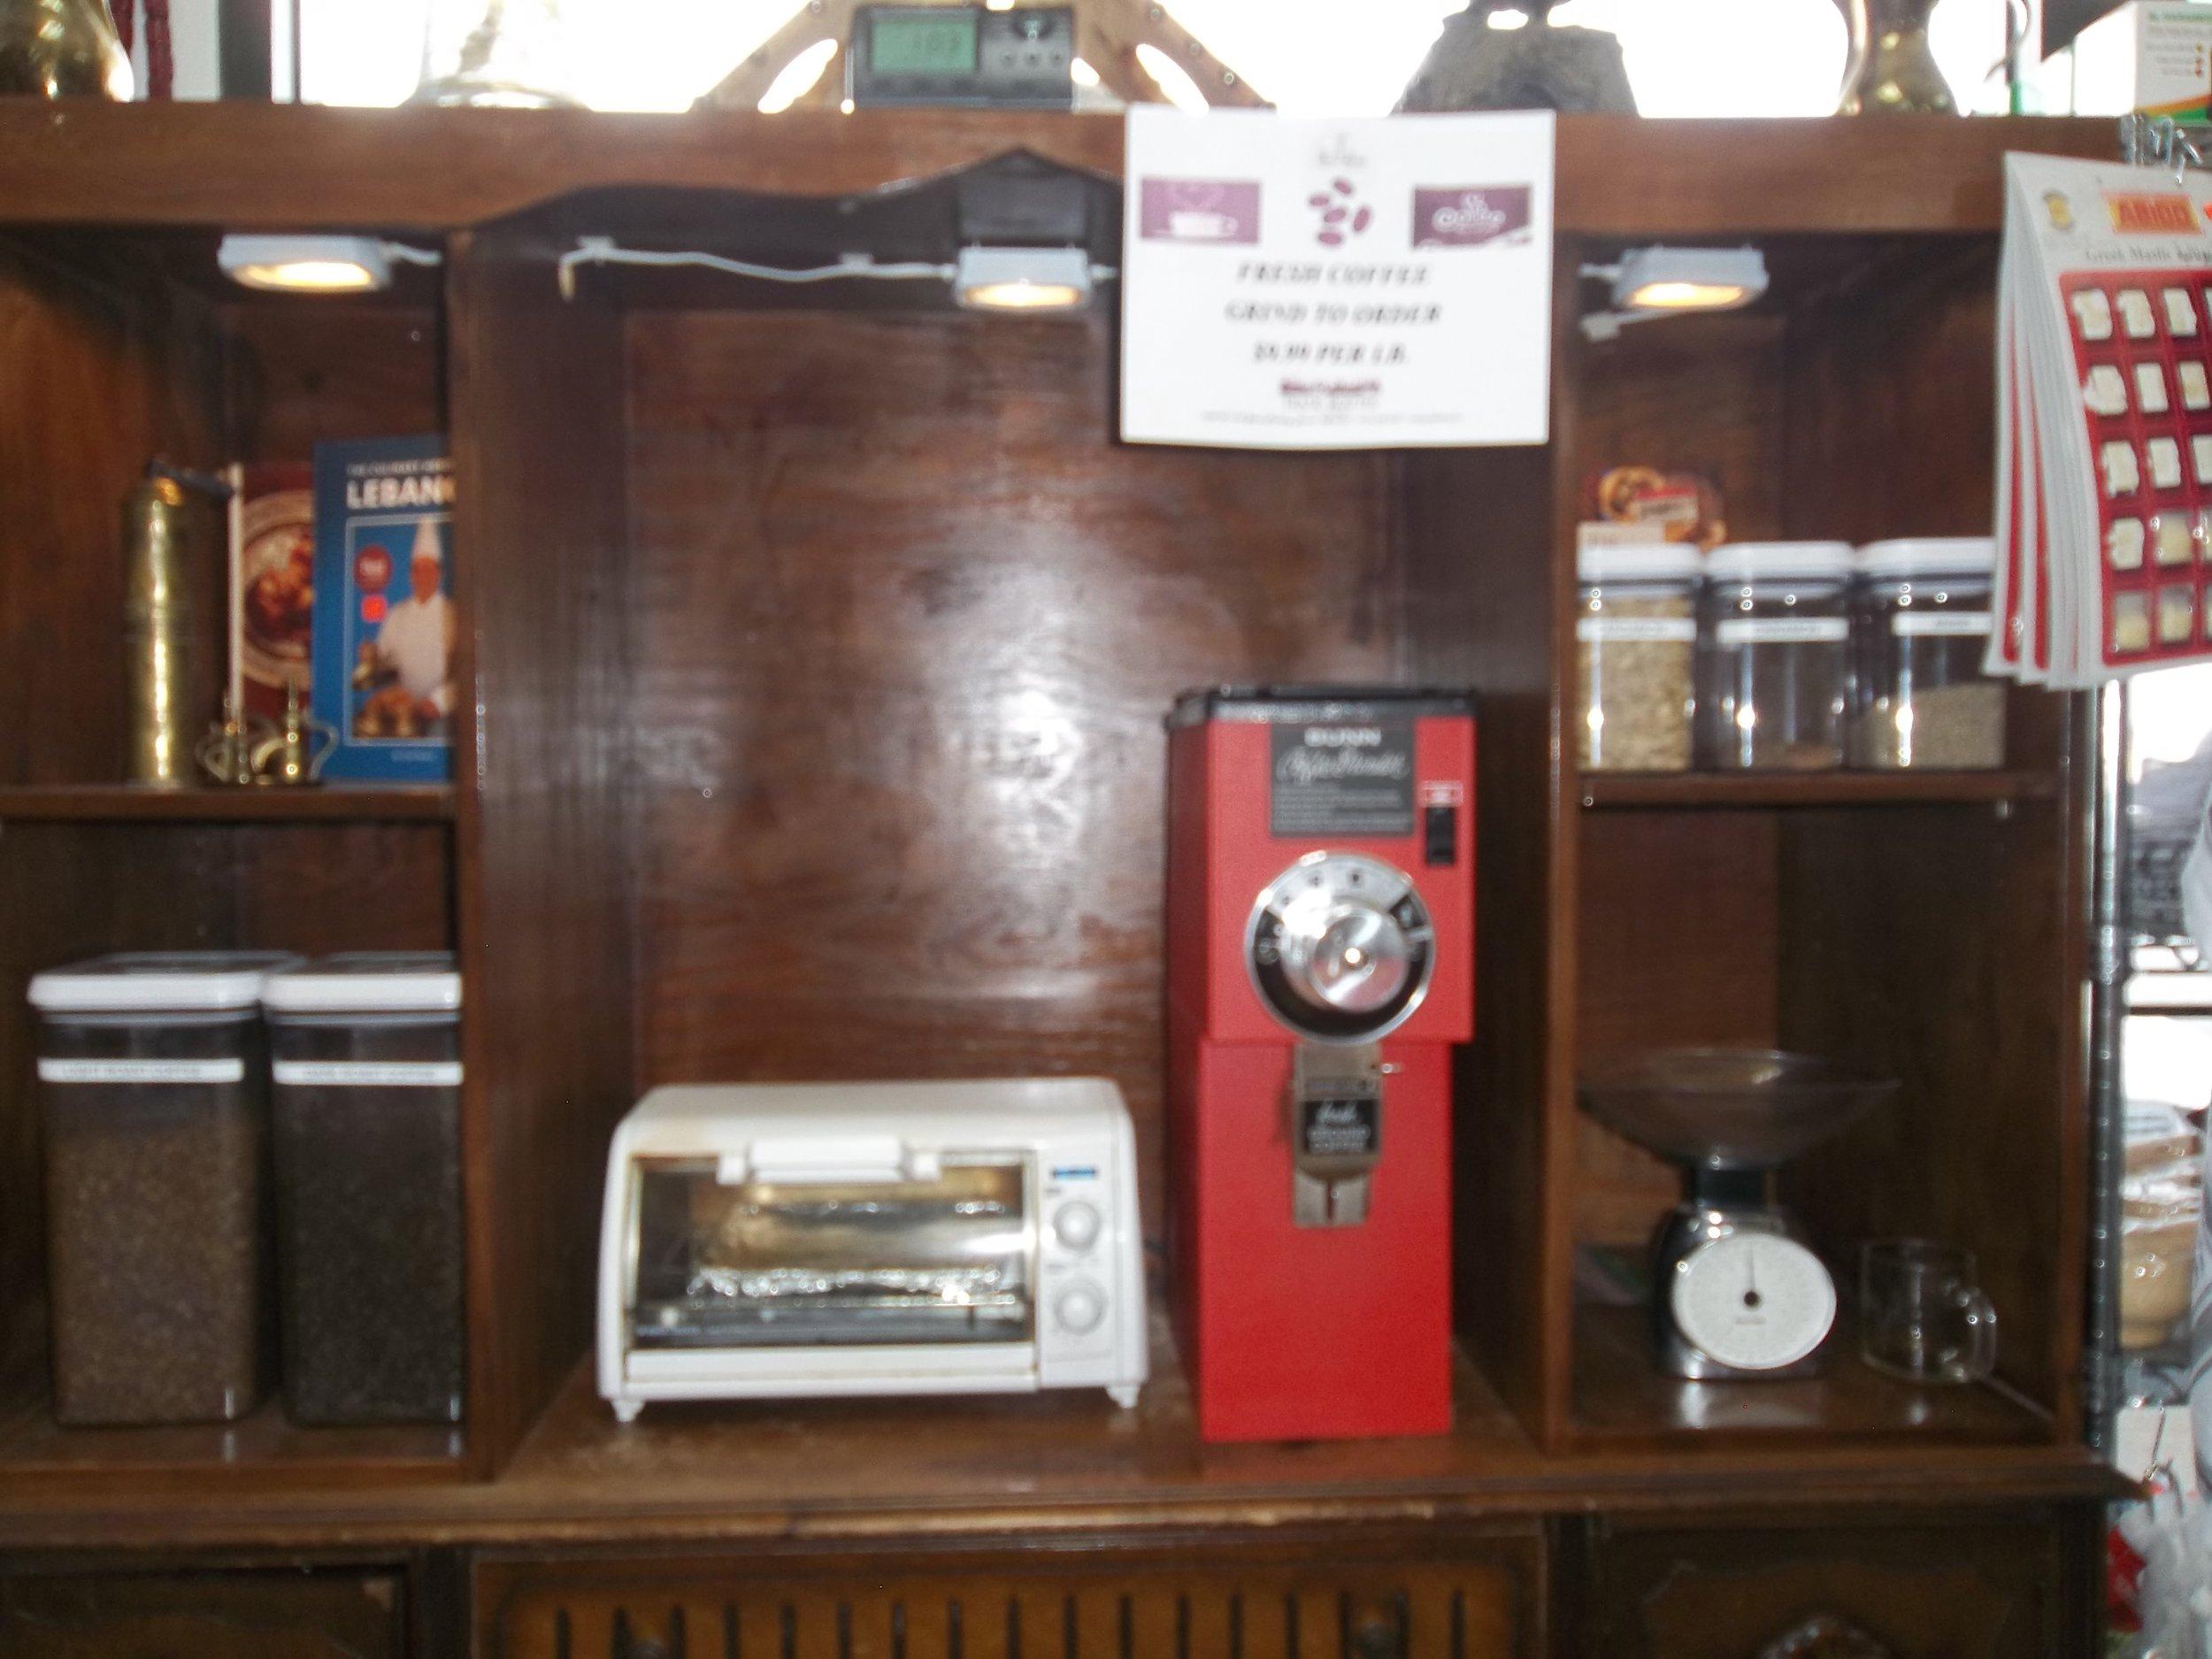 Grind-Turkish-Coffee-Pak-Halal-Mediterranean- Grocery-Store-12259-W-87th-St-Pkwy-Lenexa-KS-66215.JPG